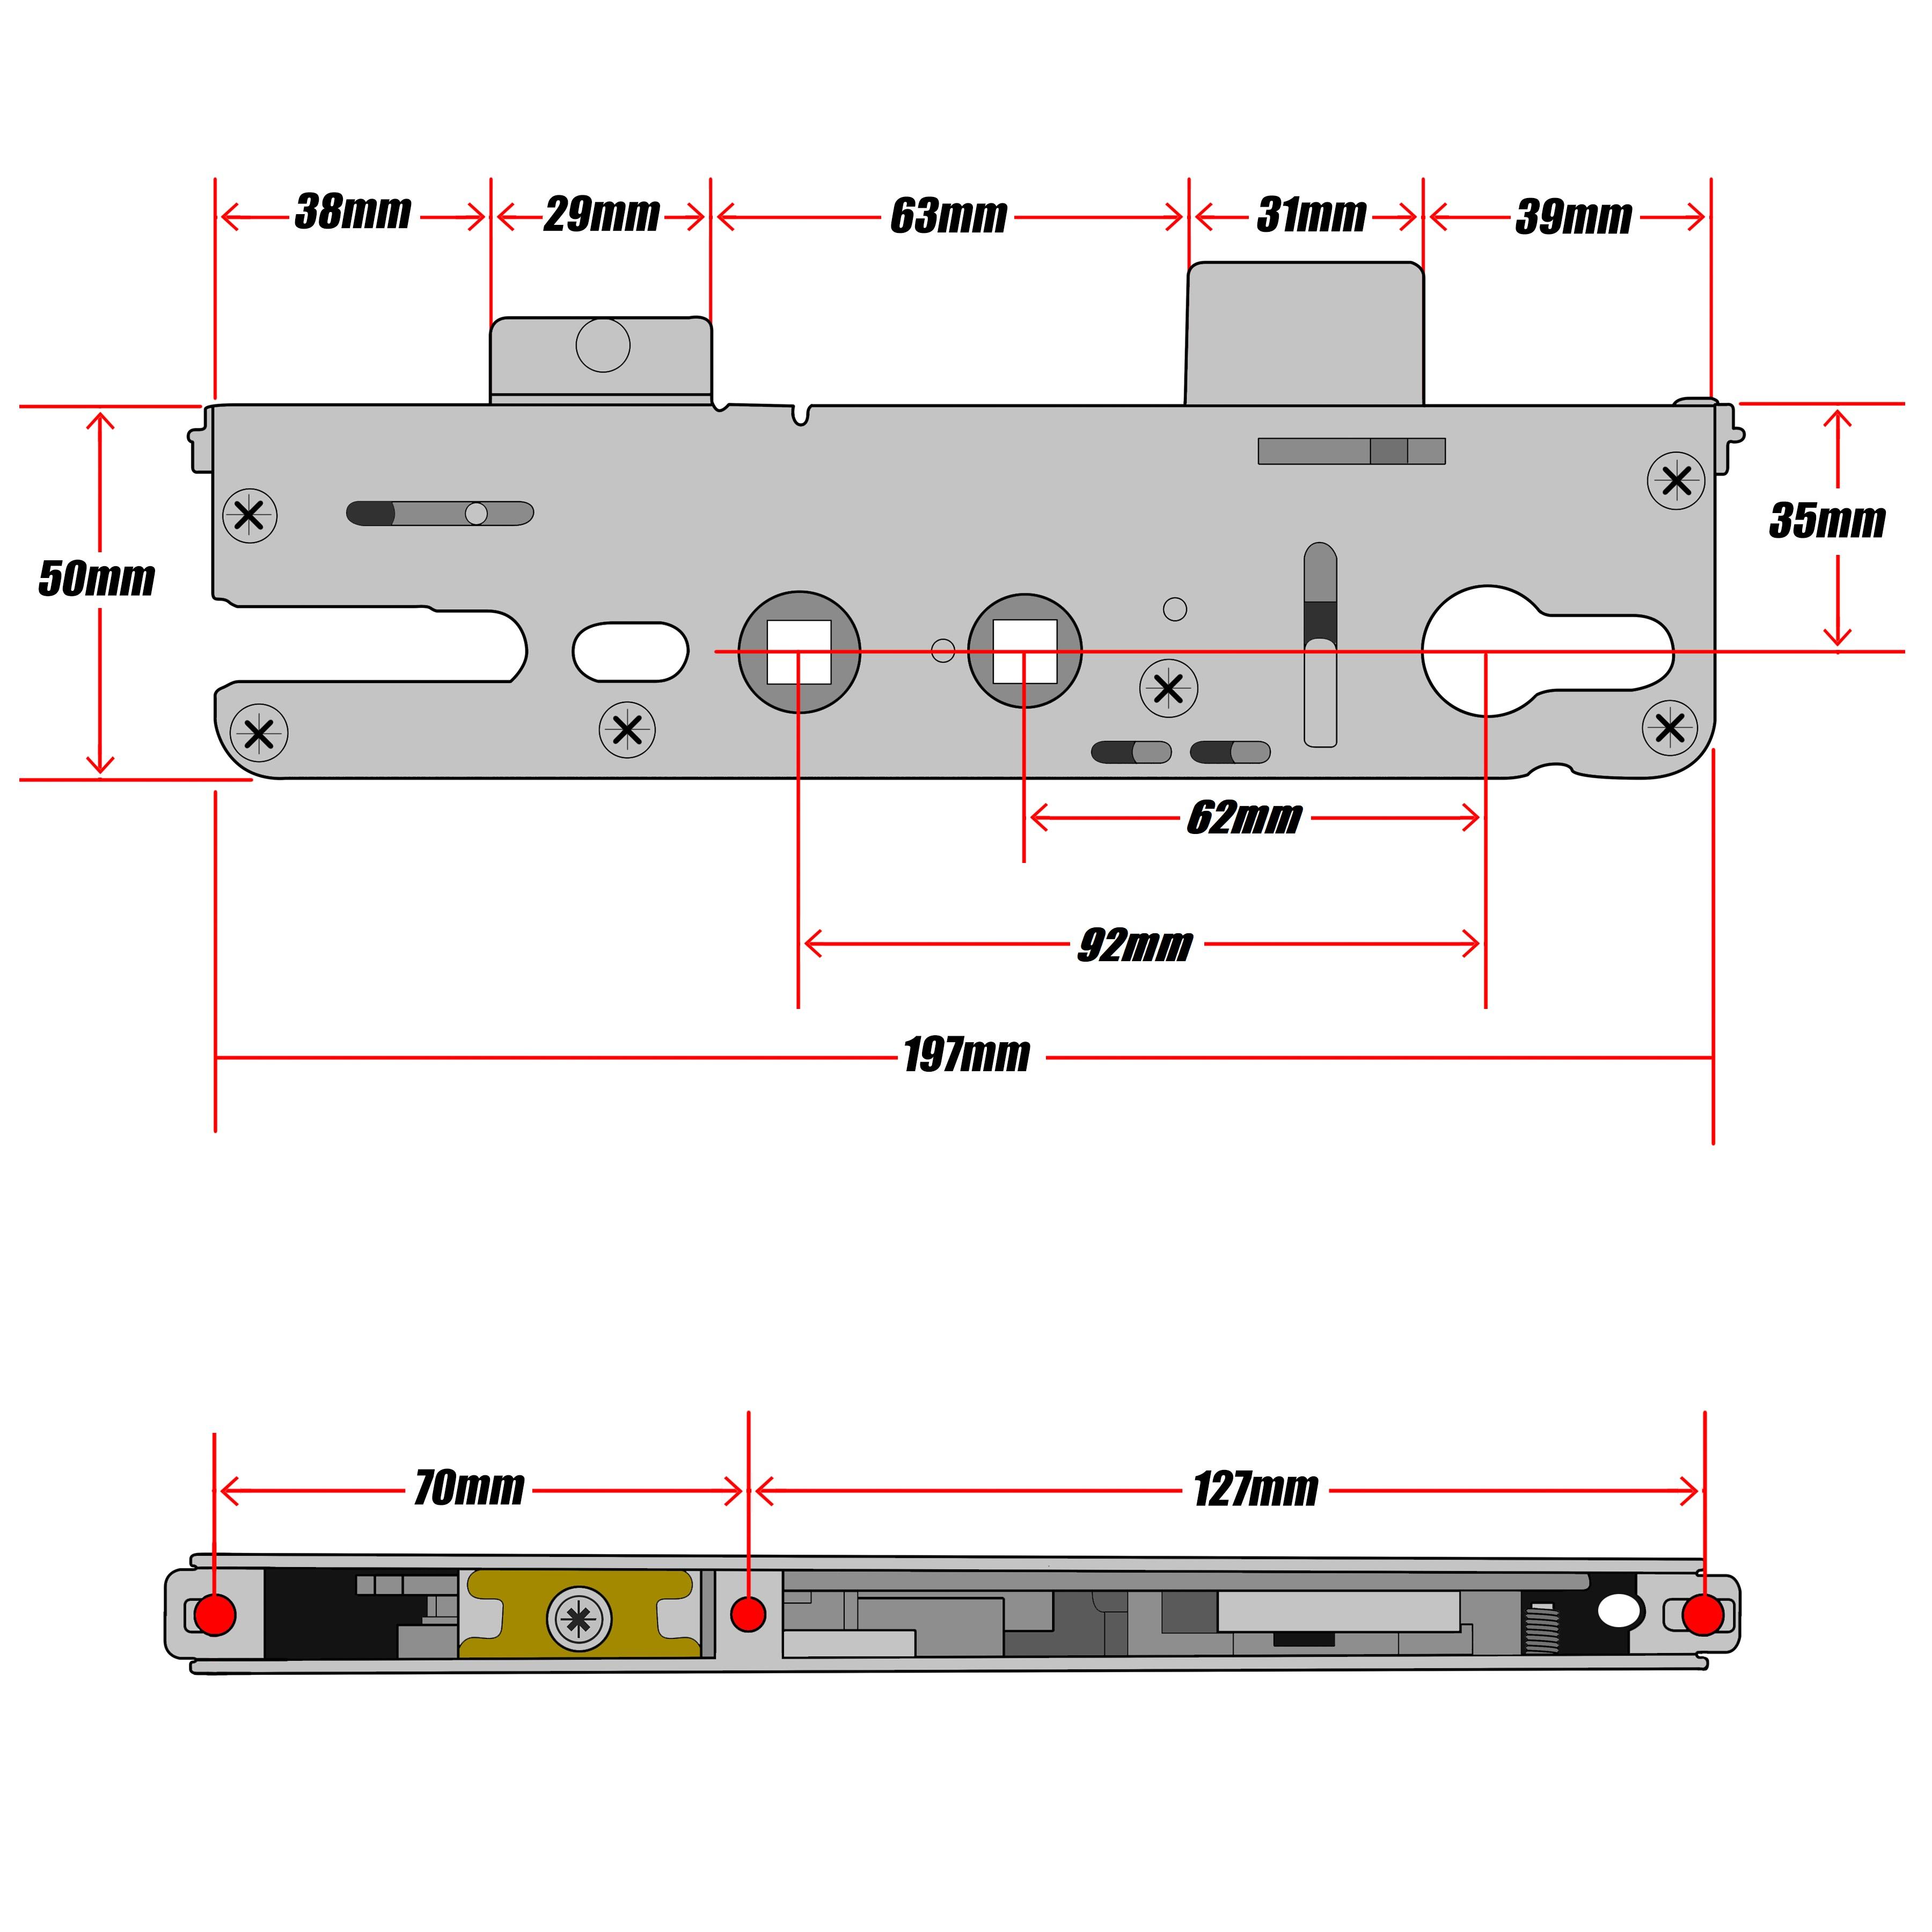 Roto Replacement Upvc Gear Box Door Lock Centre Case 35mm